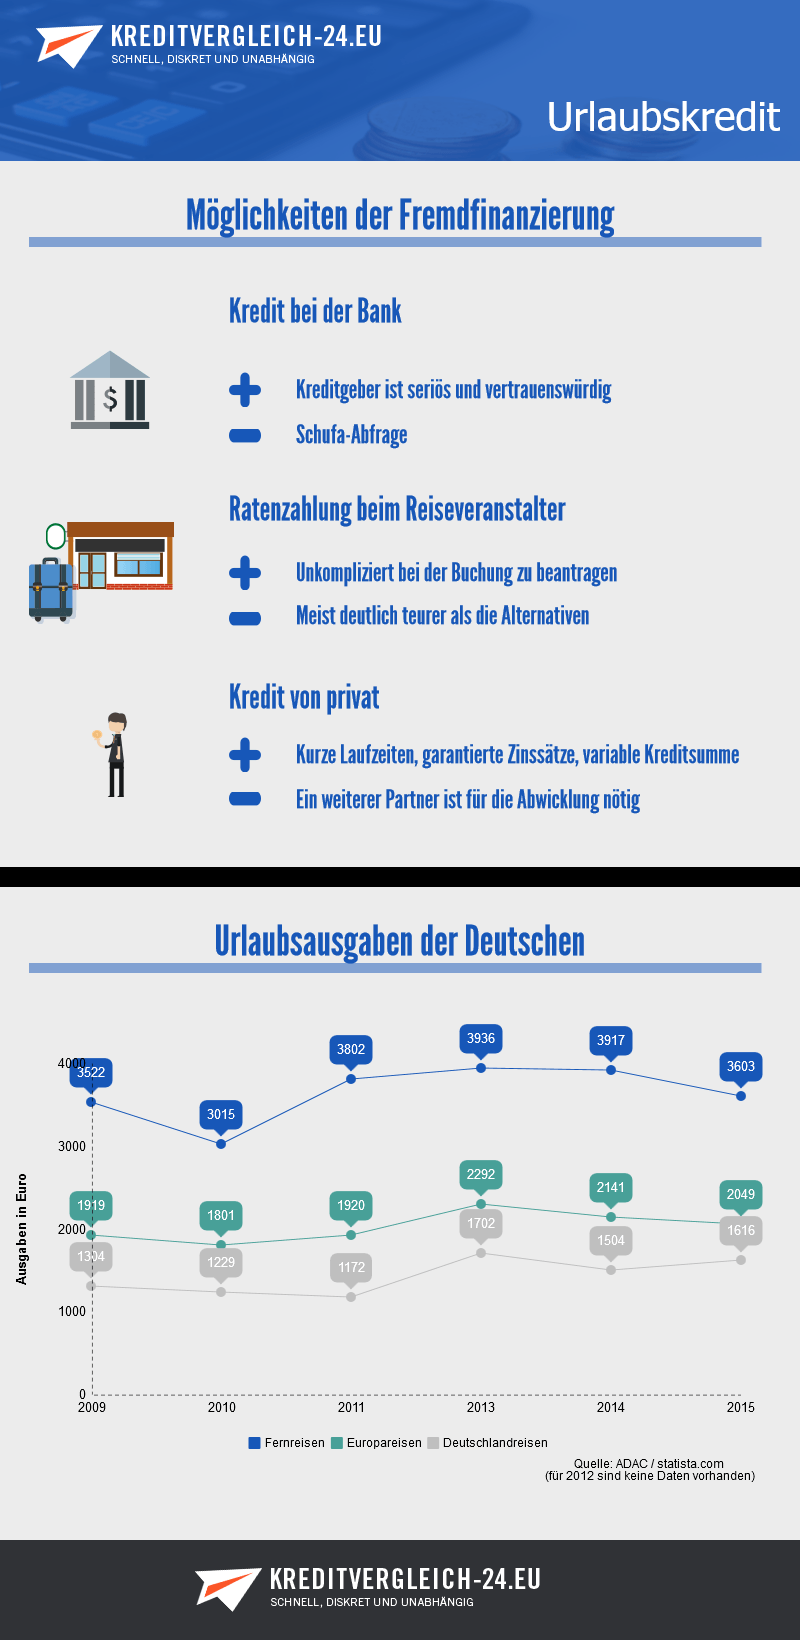 Infografik zum Urlaubskredit